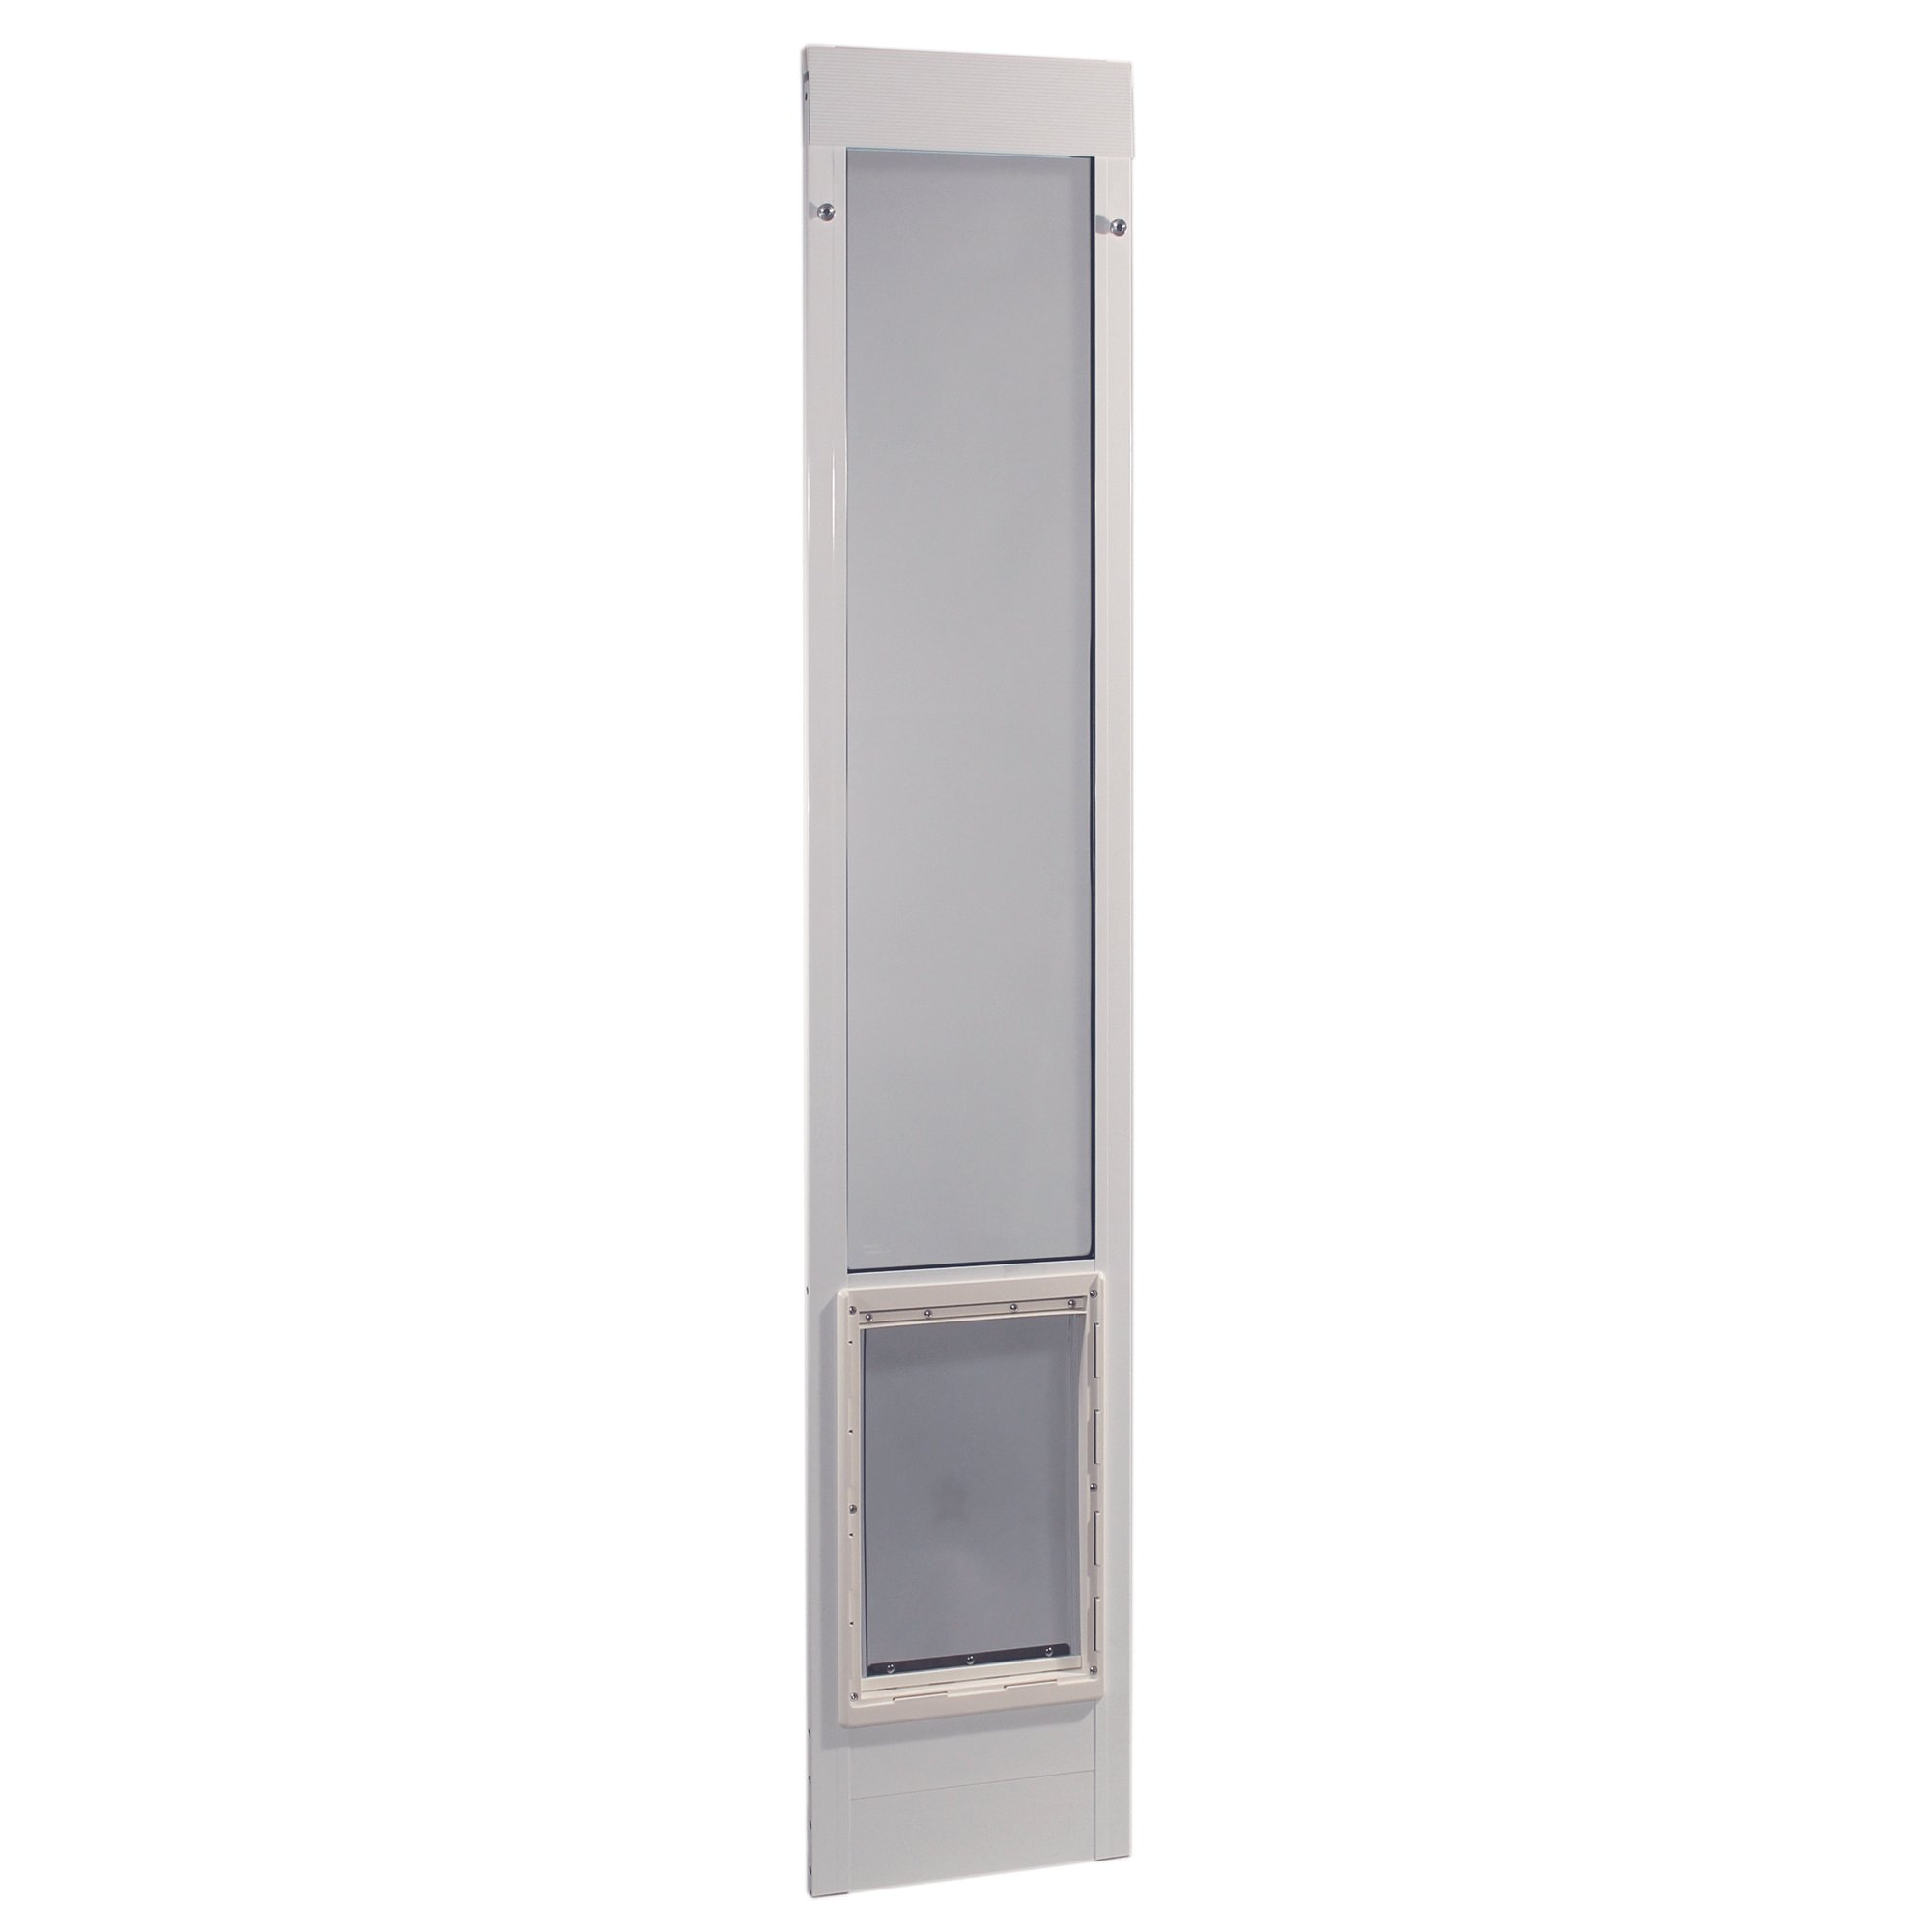 Ideal Pet Products 75PATSLW 75'' Fast Fit Aluminum Pet Patio Door, Super Large/15'' x 20'', White